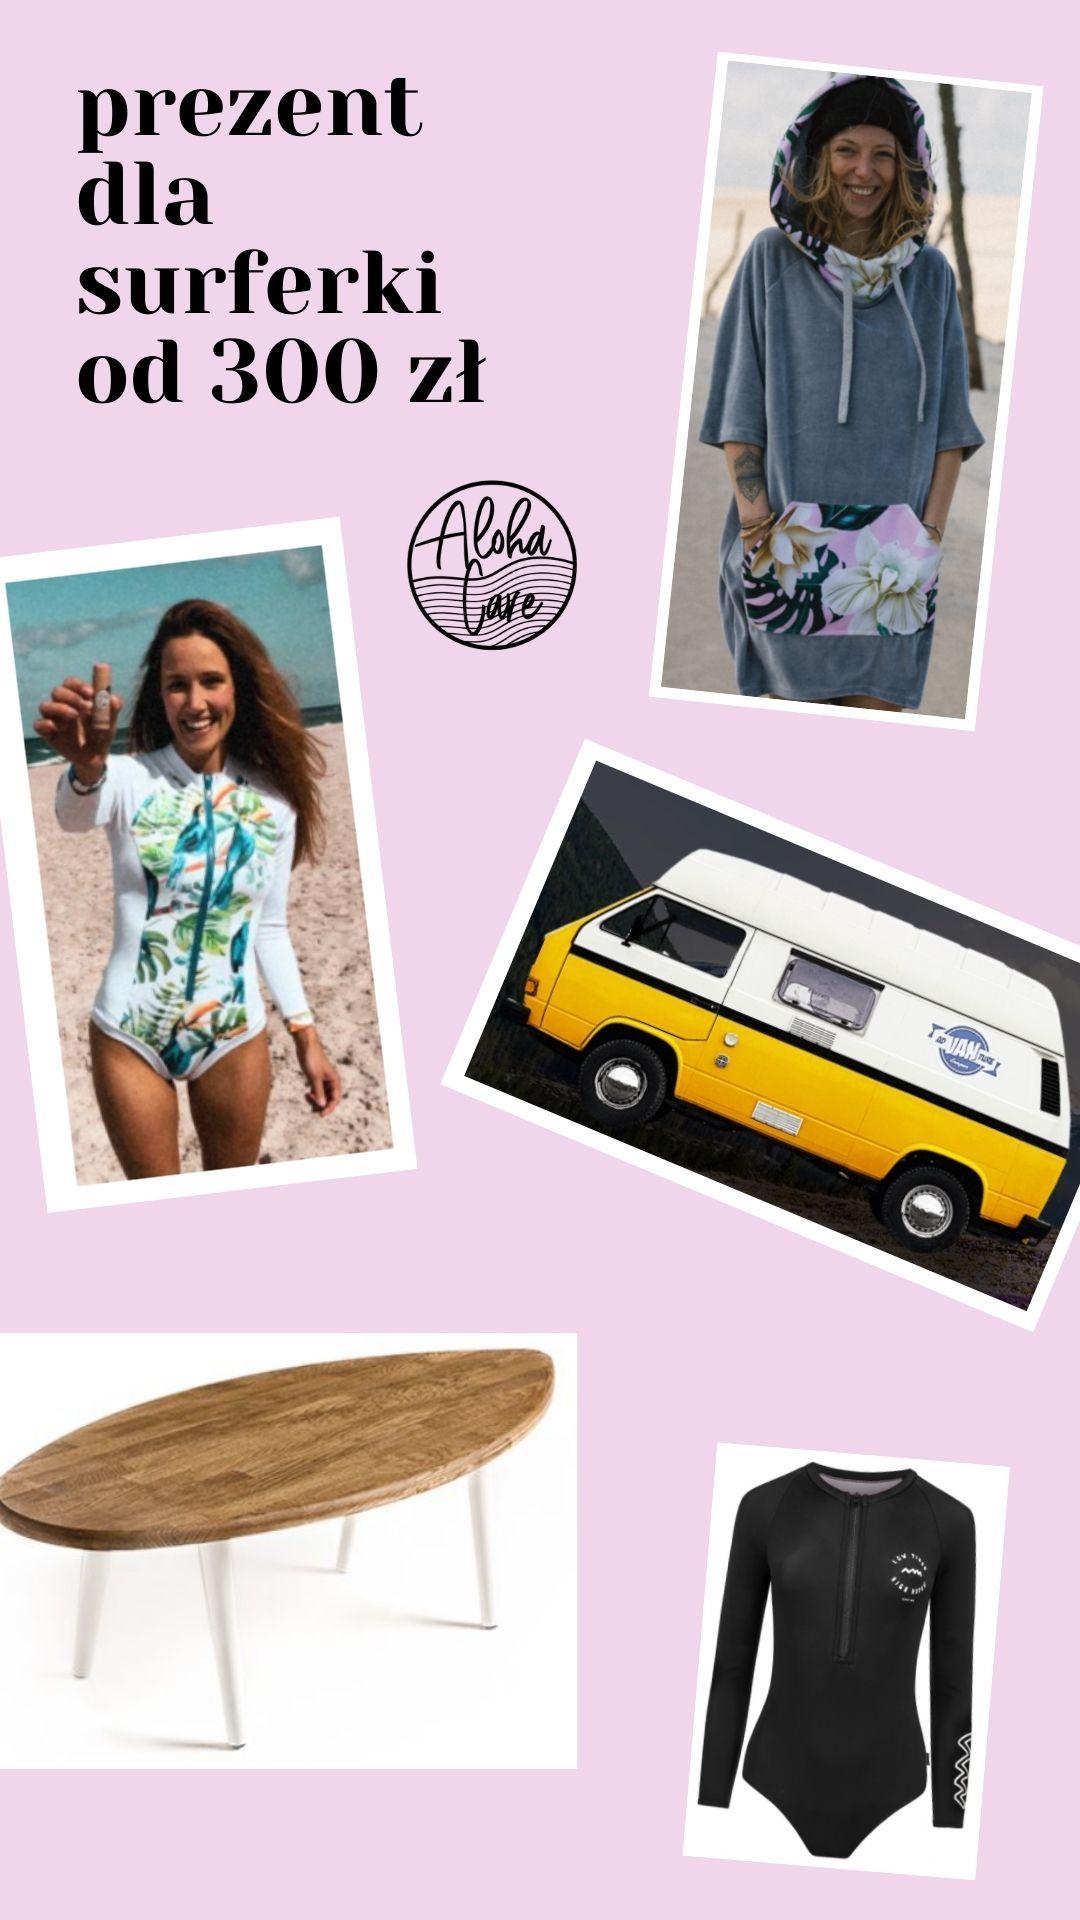 Prezent dla surferki prezent dla kitesurferki aloha care